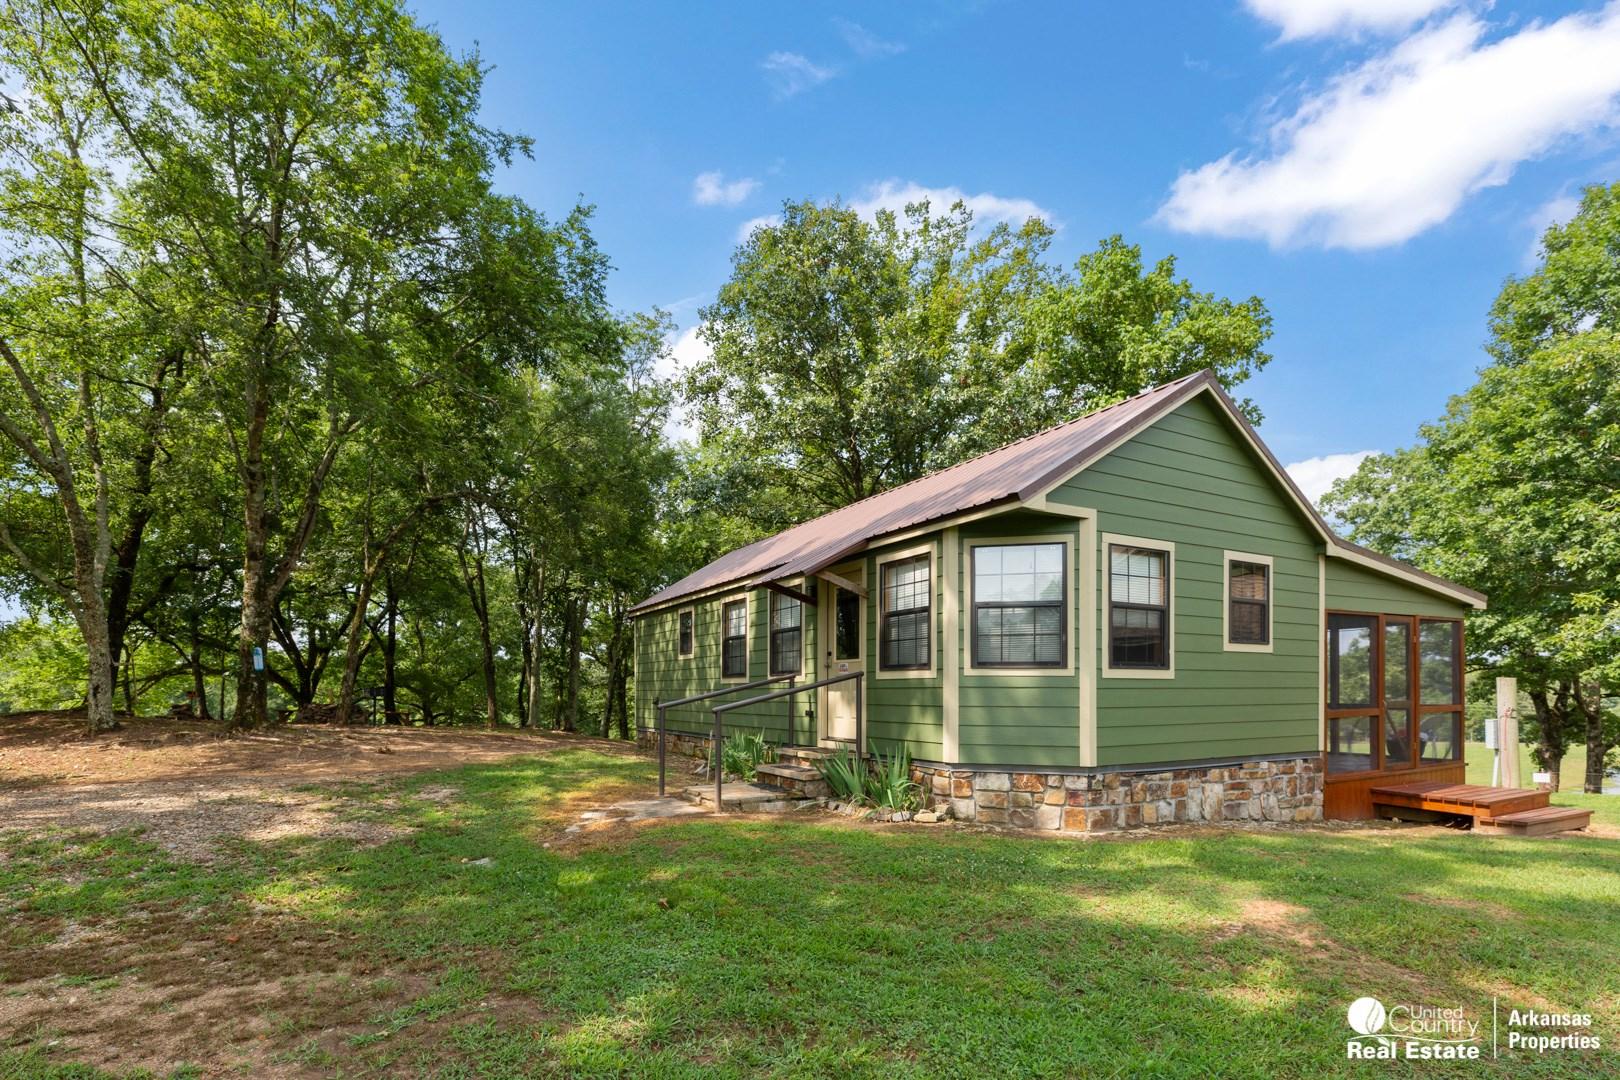 Cabin for Sale in Arkansas